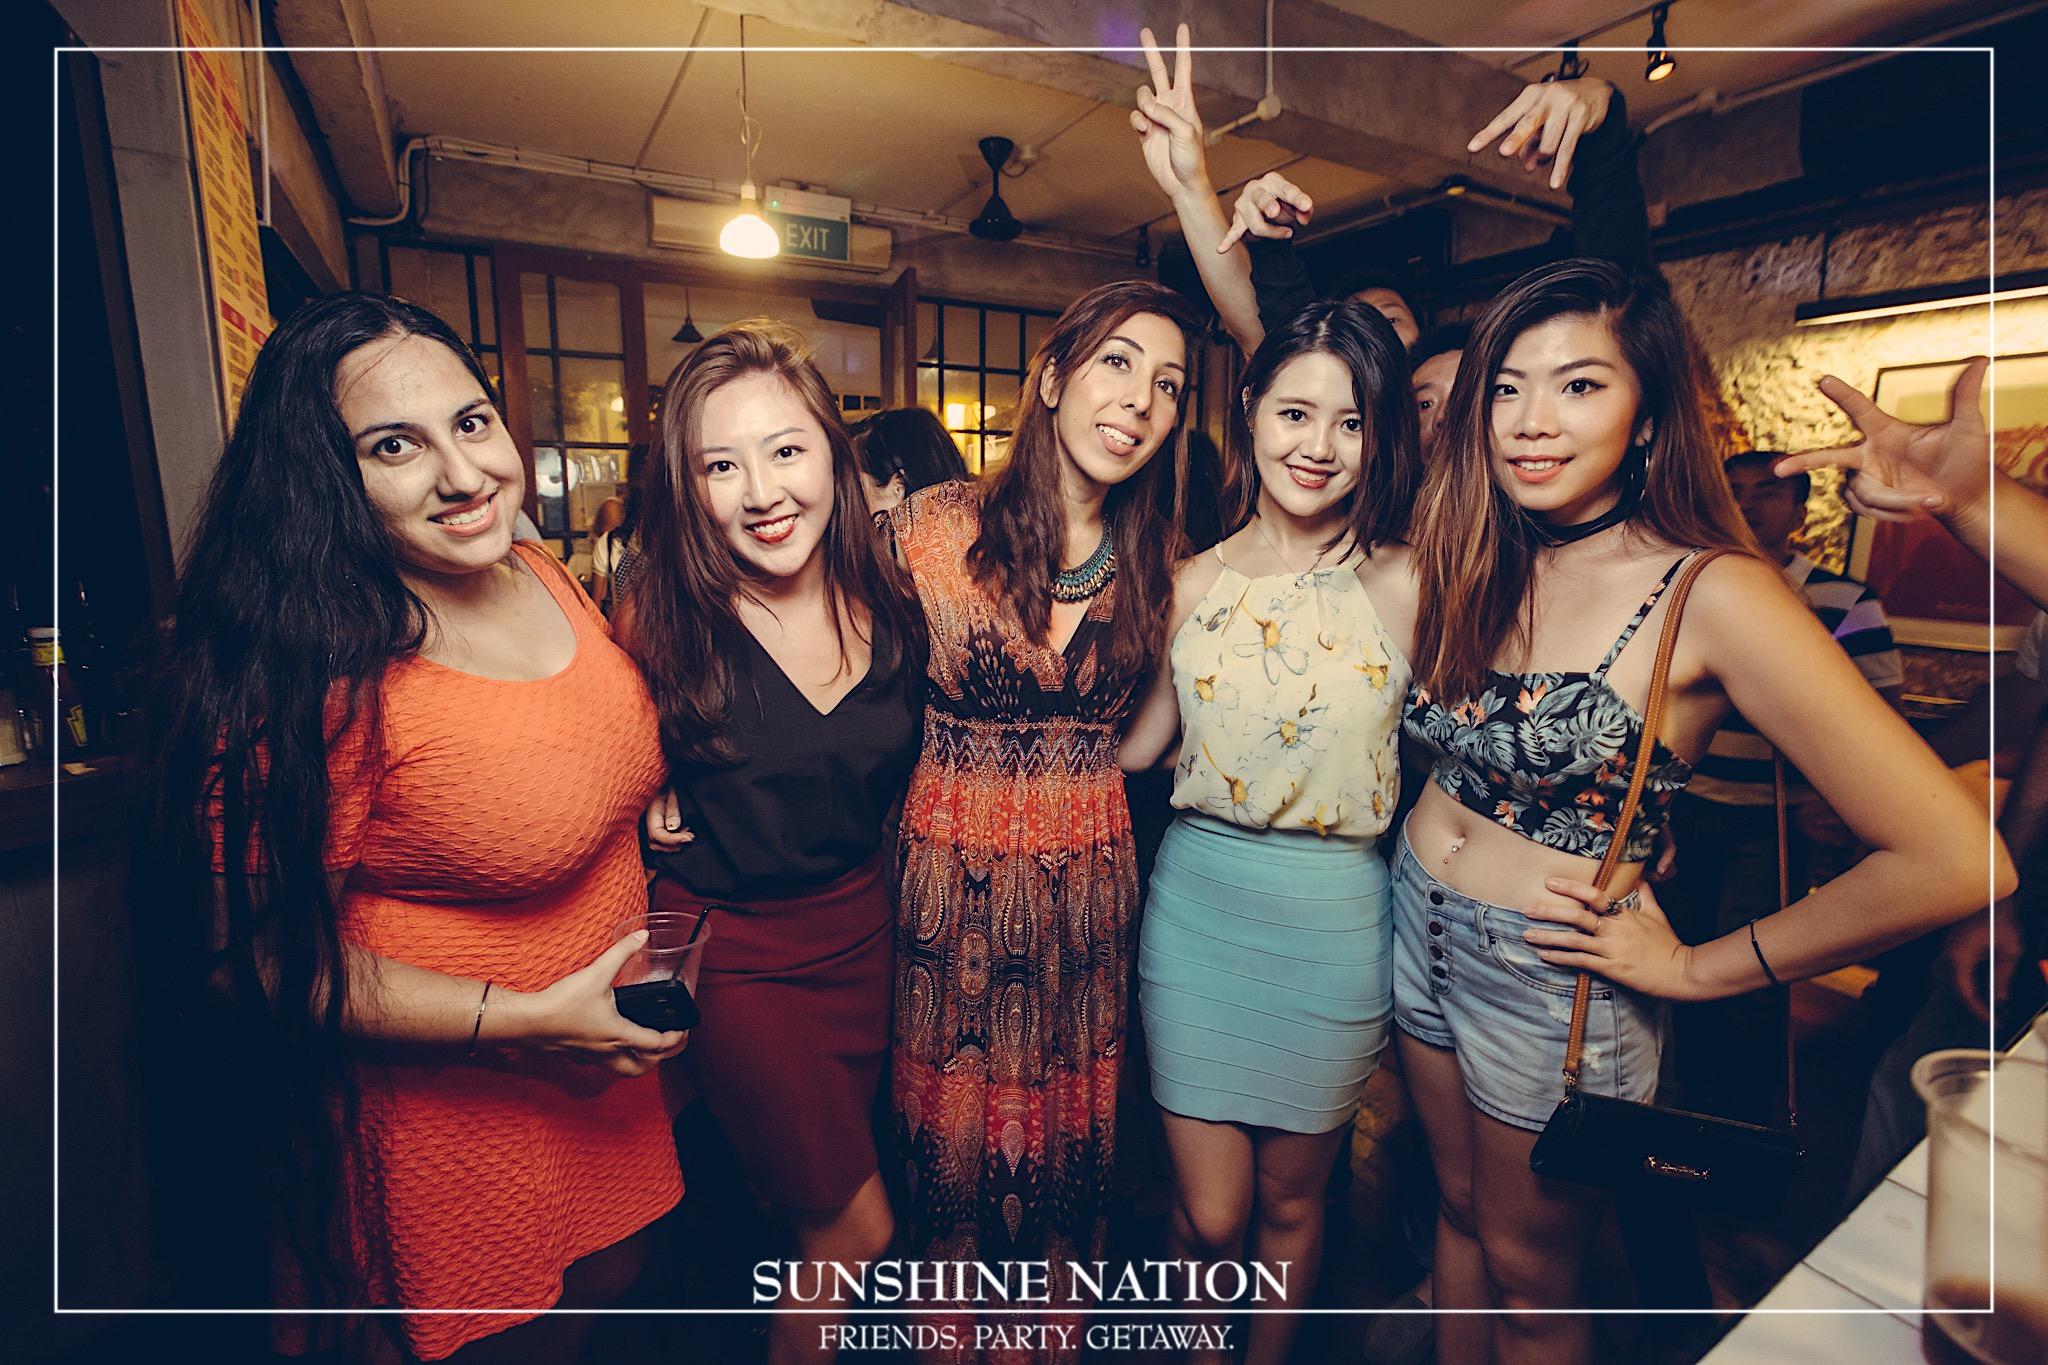 16092016_SunshineNation_Colossal046_Watermarked.jpg